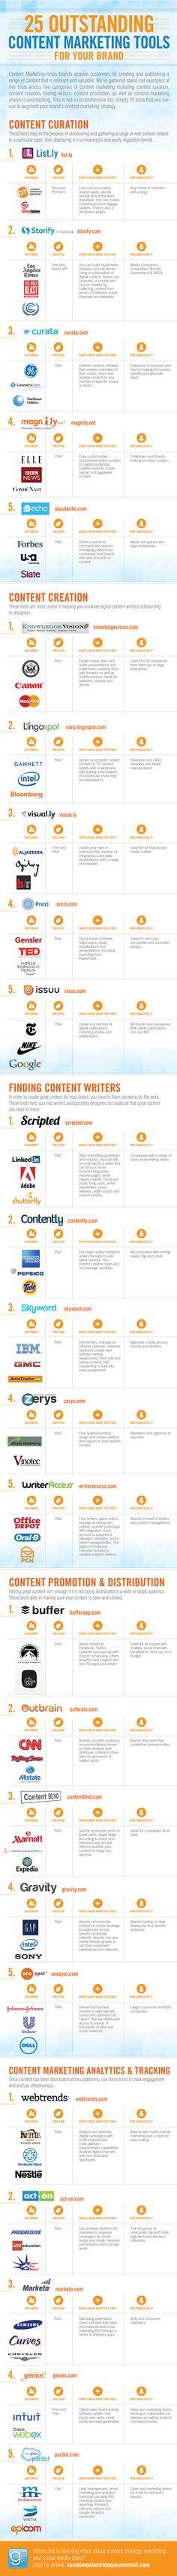 Content Marketing Tools 25 Best Content Marketing Tools... social media, tool infograph, content marketing, market tool